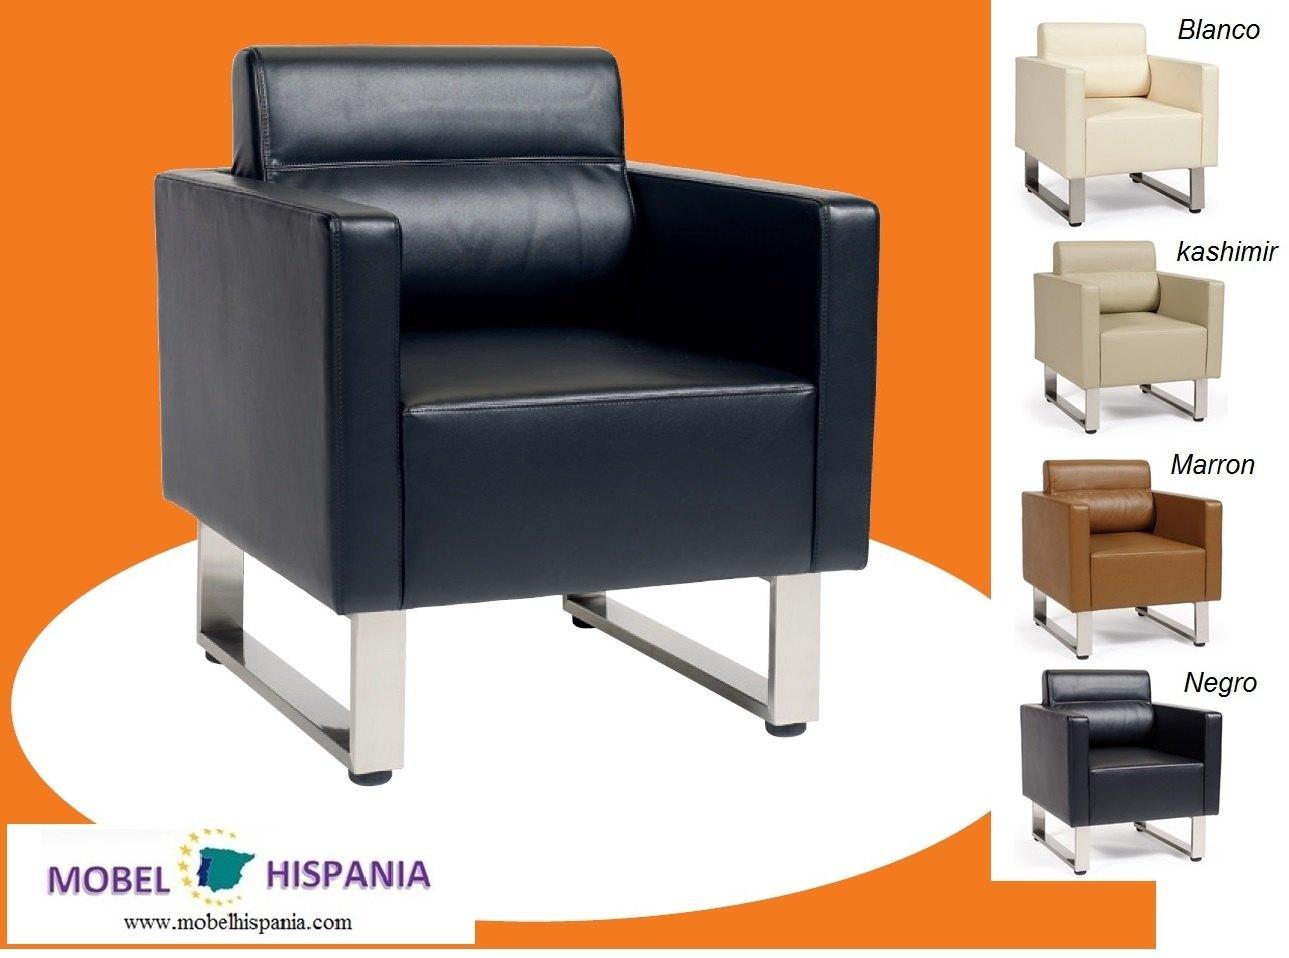 Mobel hispania mobiliario para oficinas bares for Butacas para oficina